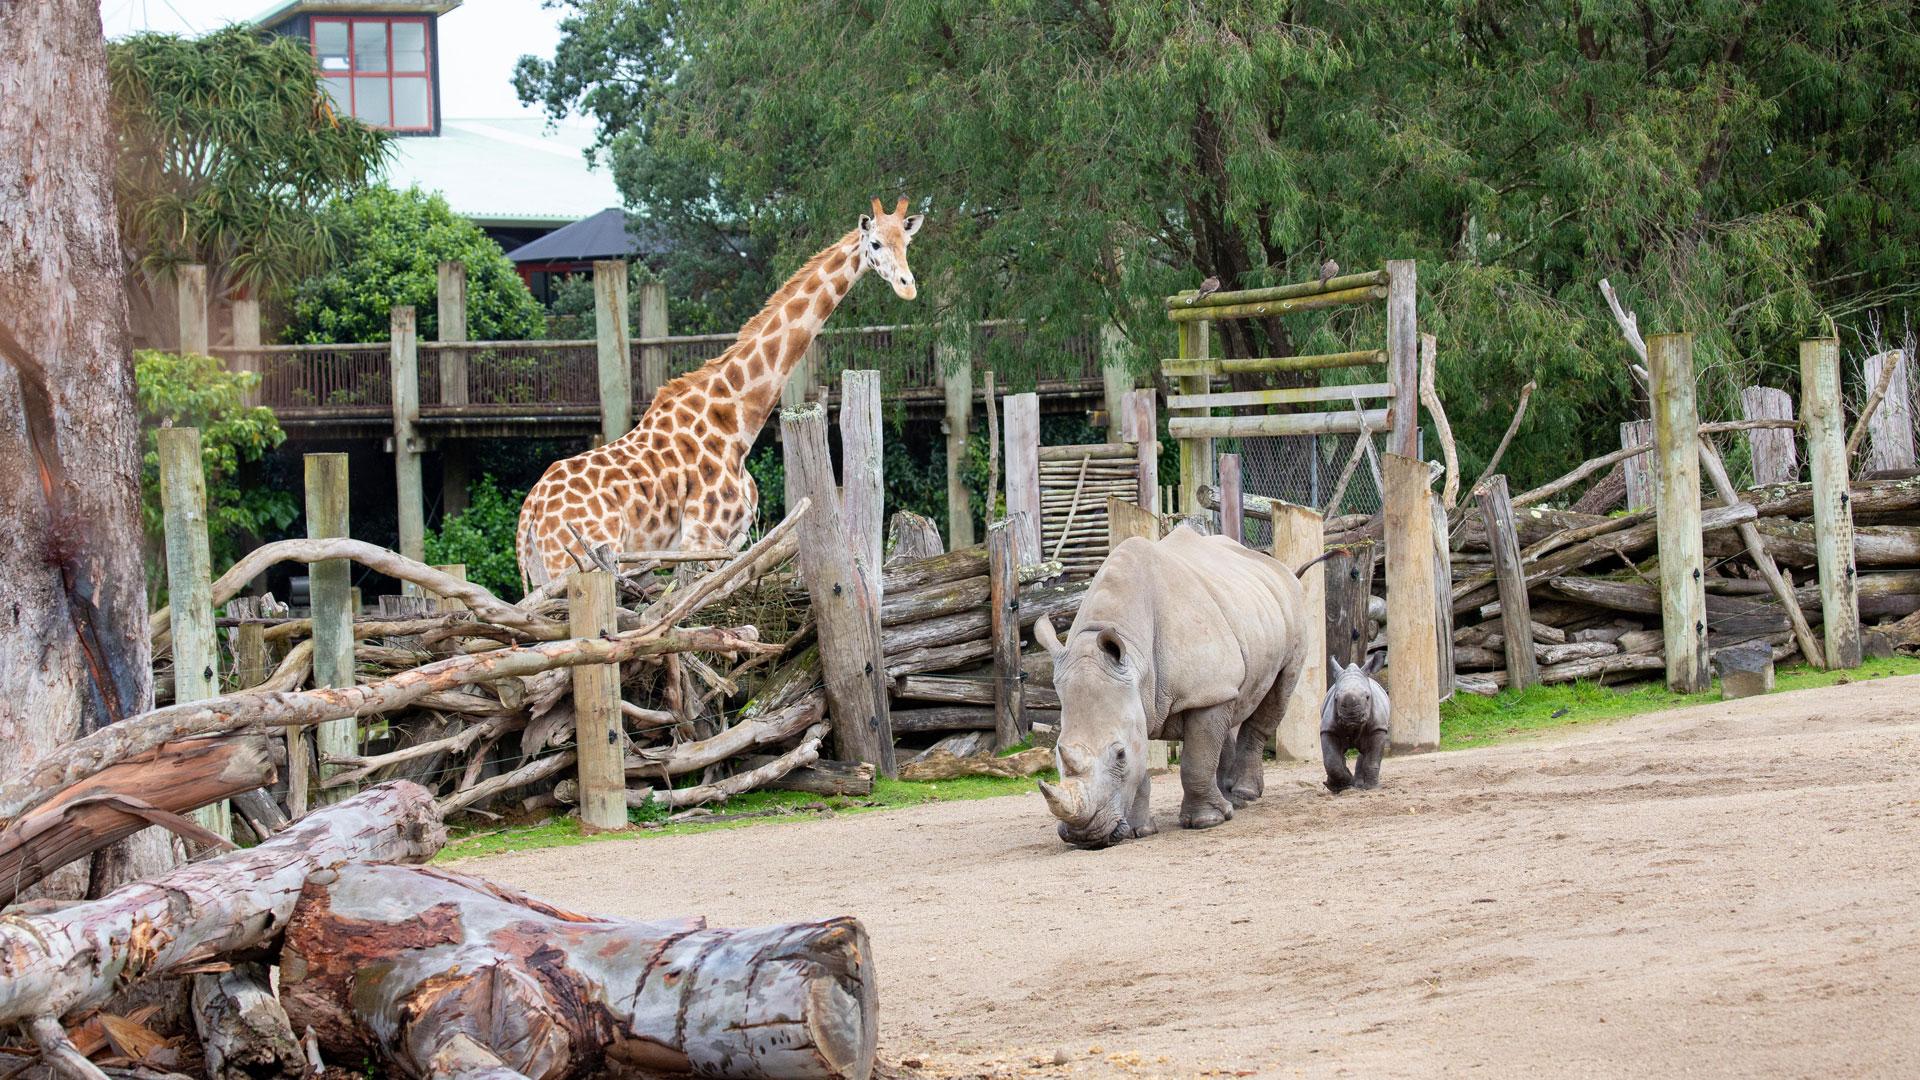 https://rfacdn.nz/zoo/assets/media/rhino-calf-in-habitat-gallery-7.jpg